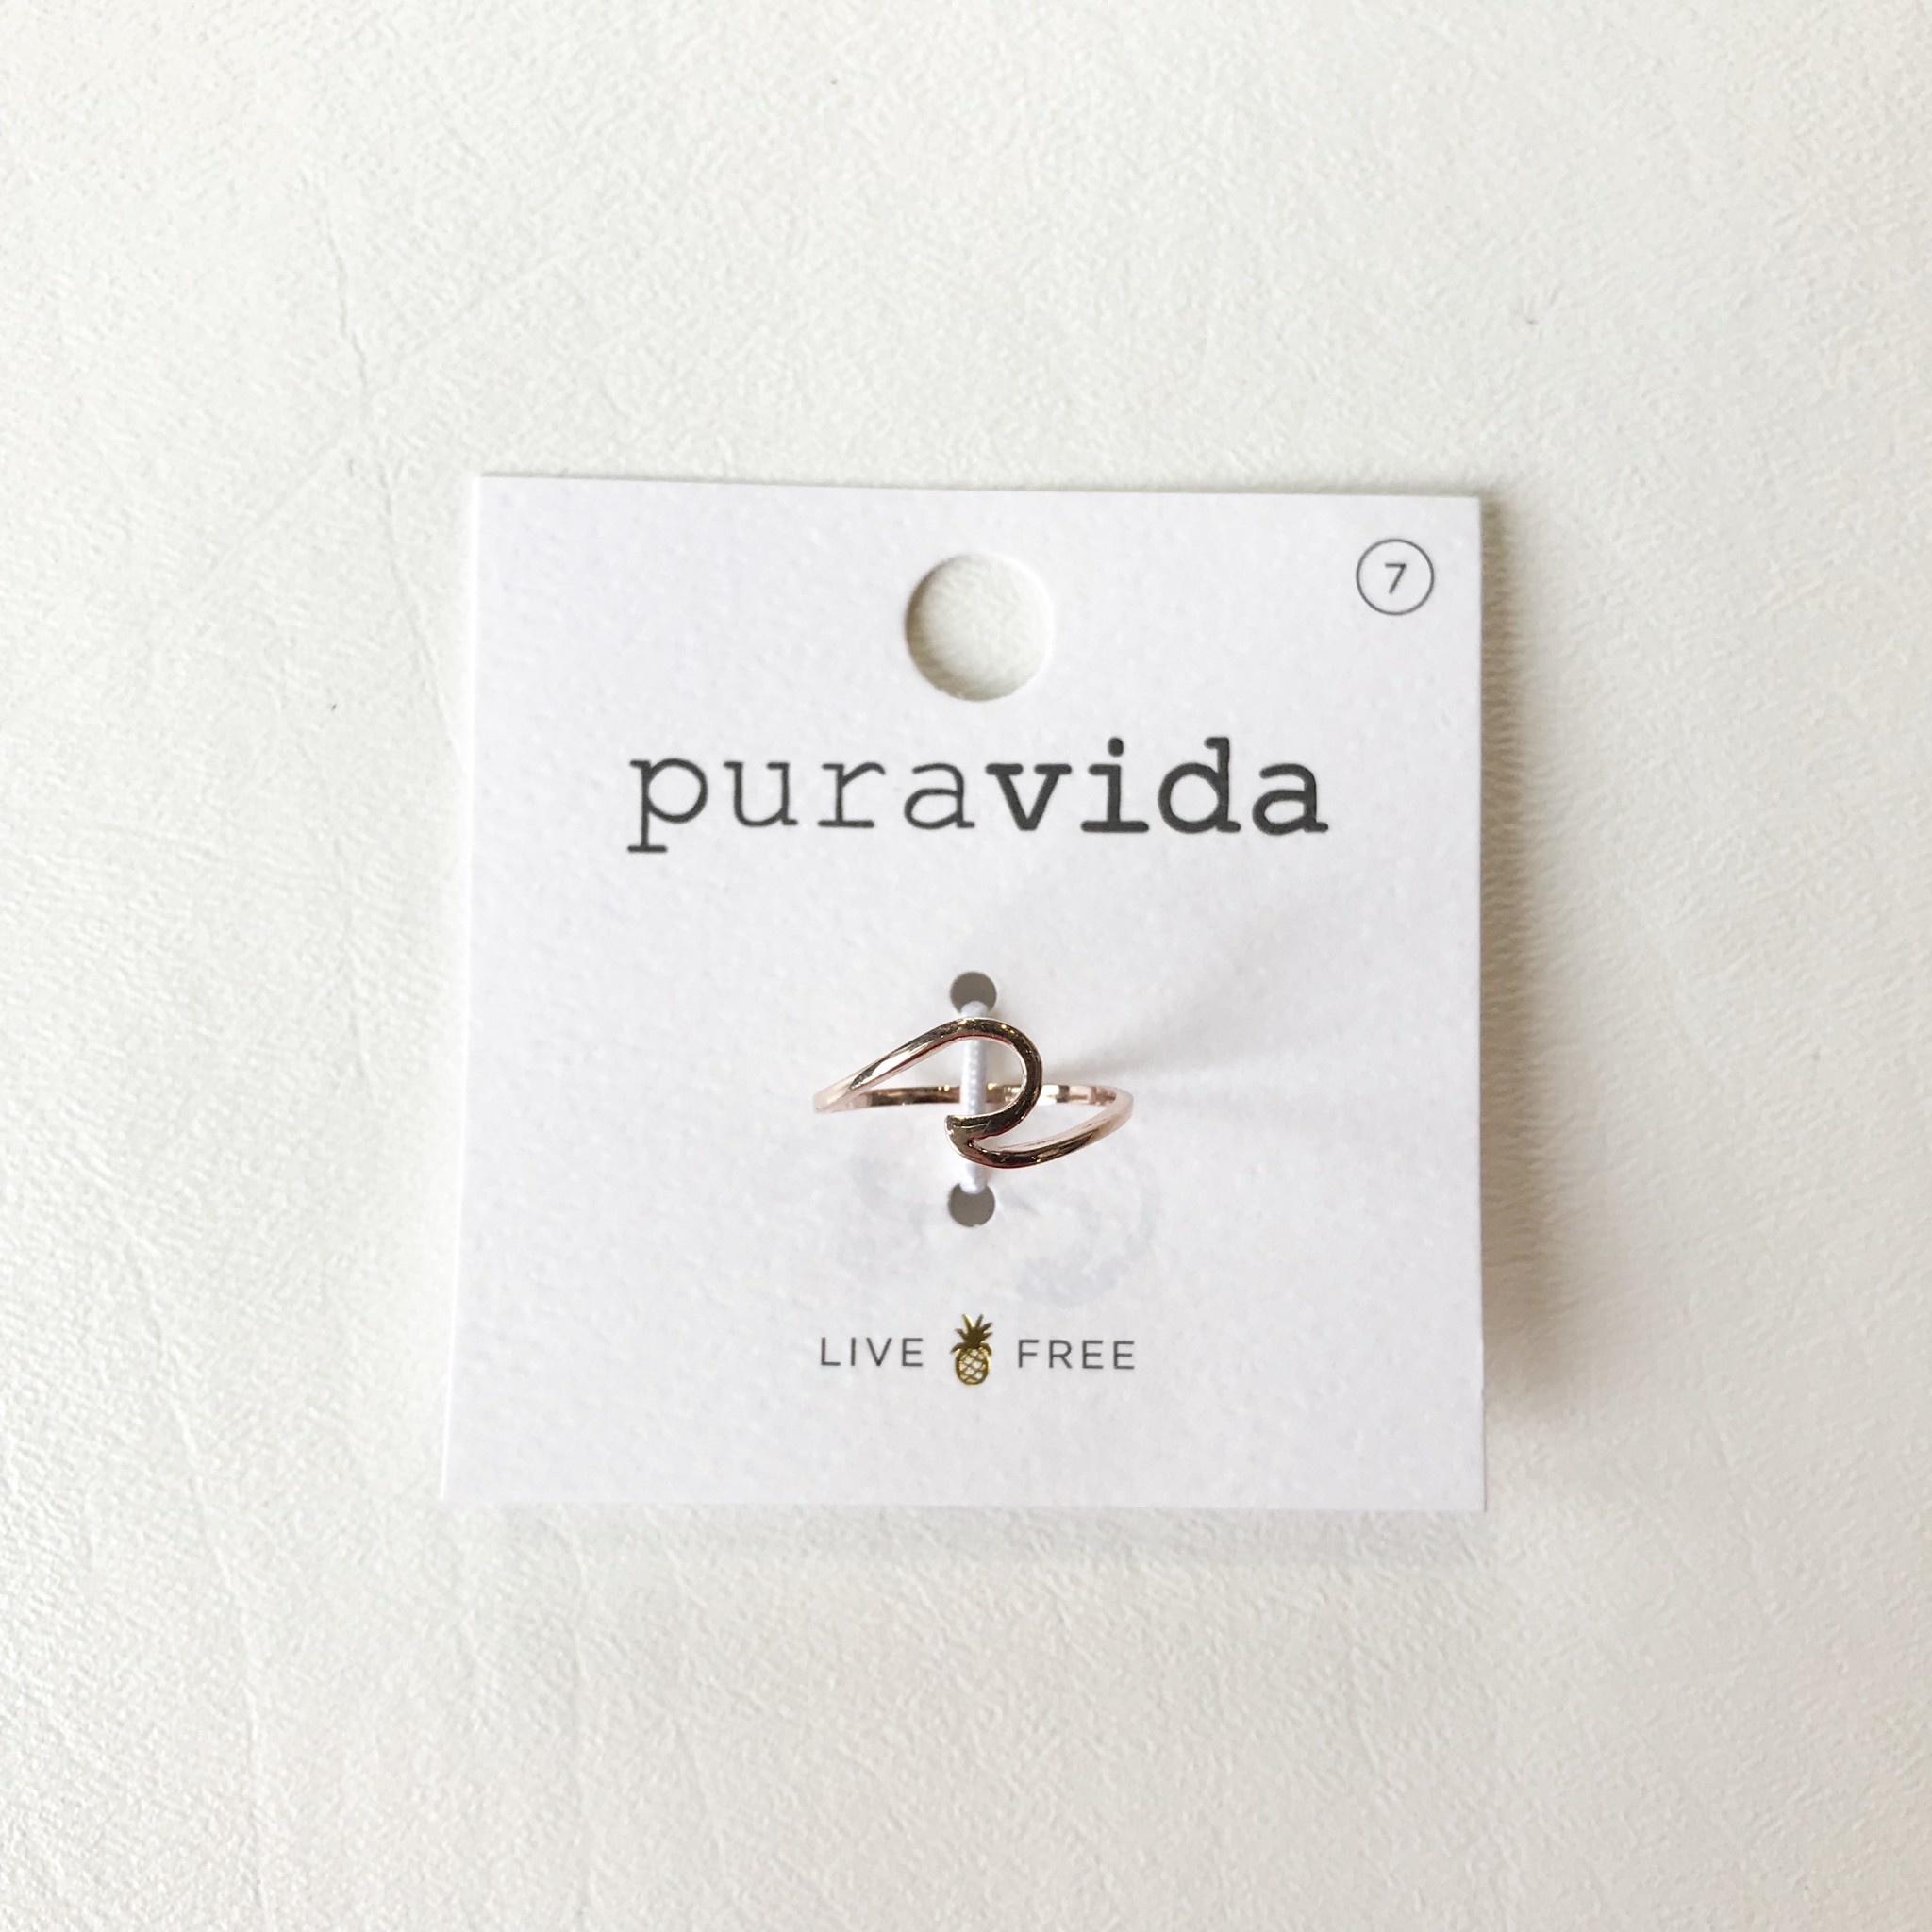 Puravida wave ring